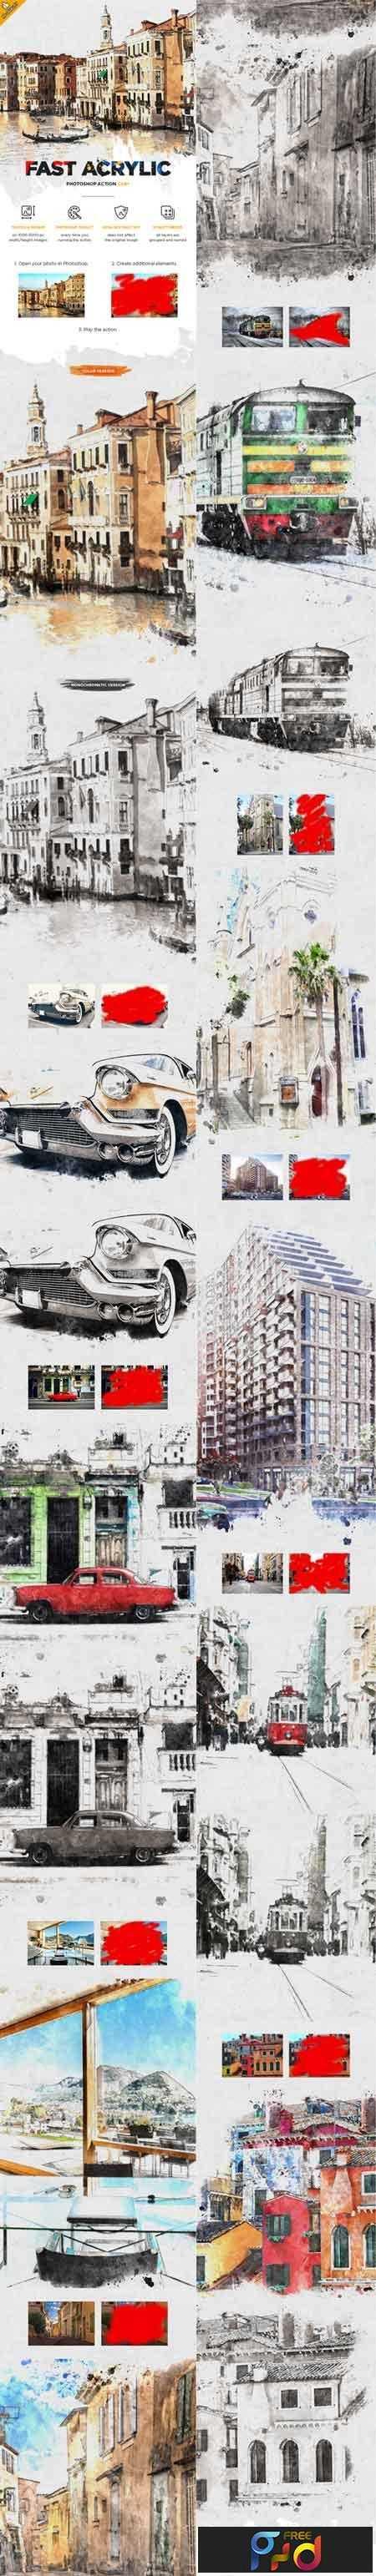 1811220 Fast Acrylic Sketch CS4+ Photoshop Action 22438094 1